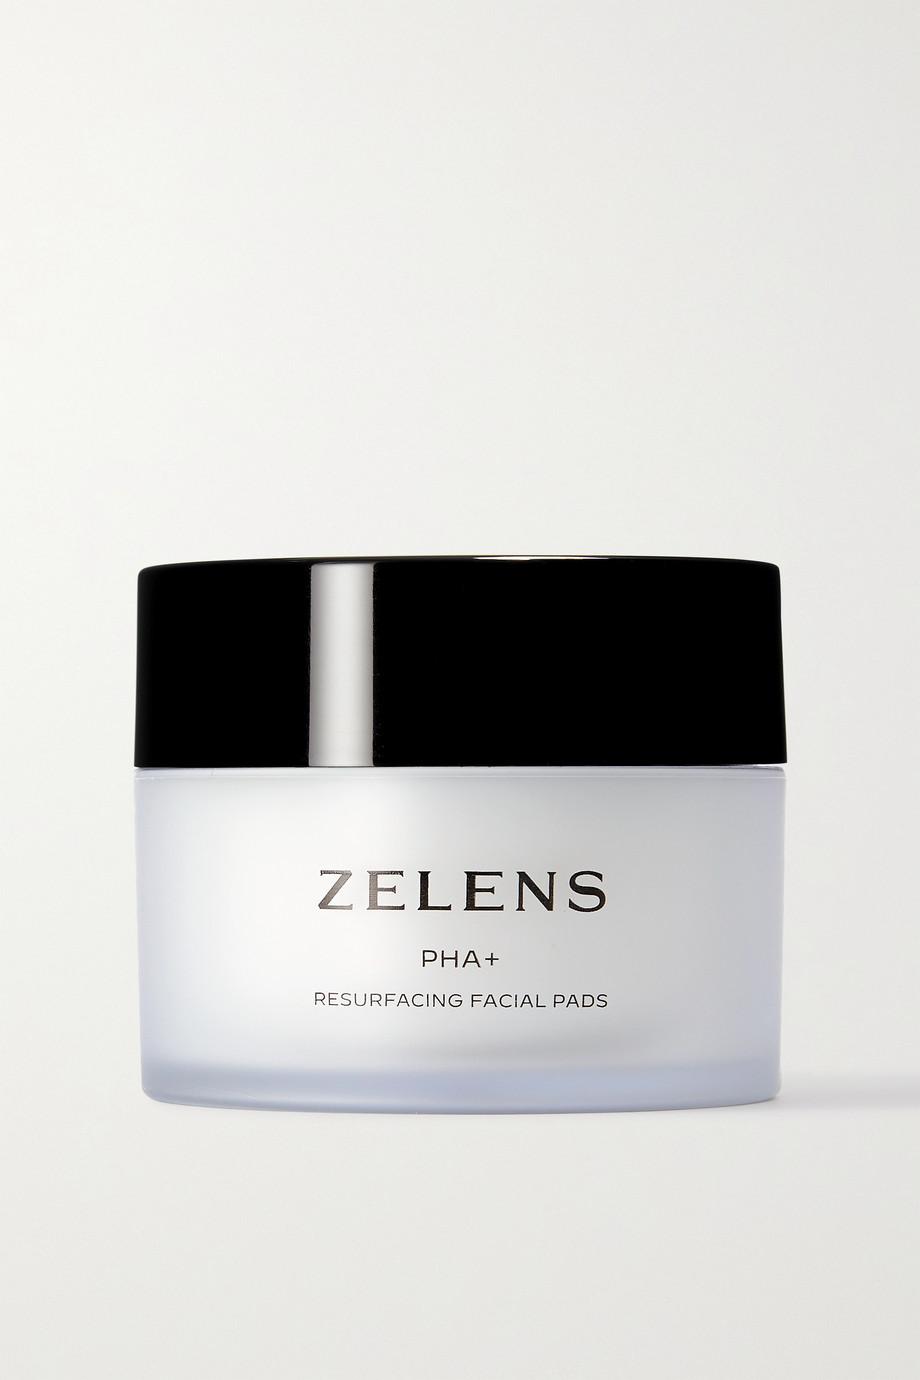 Zelens PHA+ Bio-Peel Resurfacing Facial Pads – 50 Gesichtspads